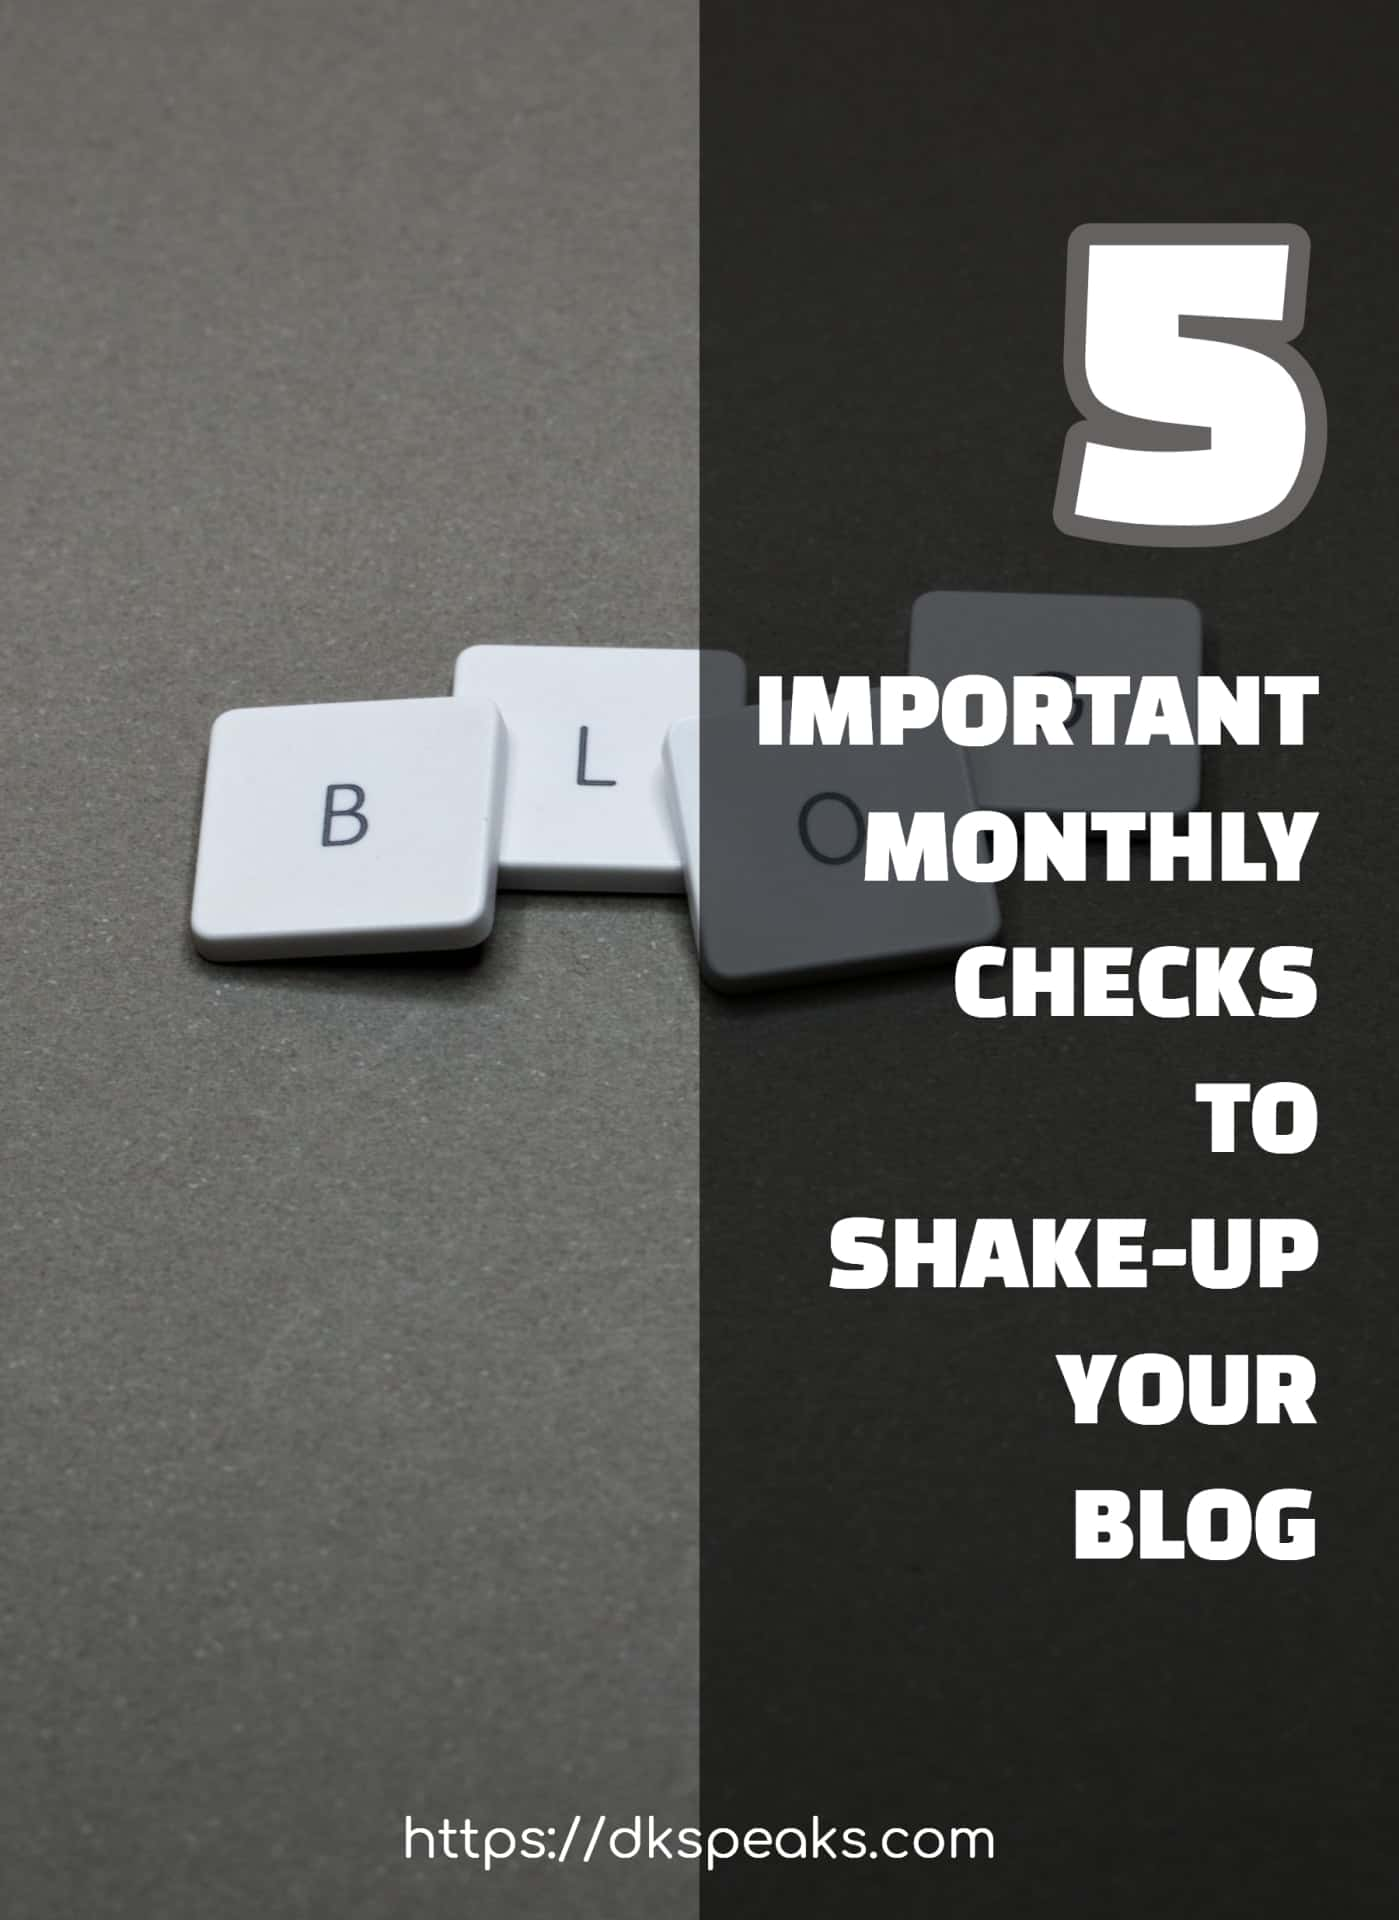 Monthly blog checks